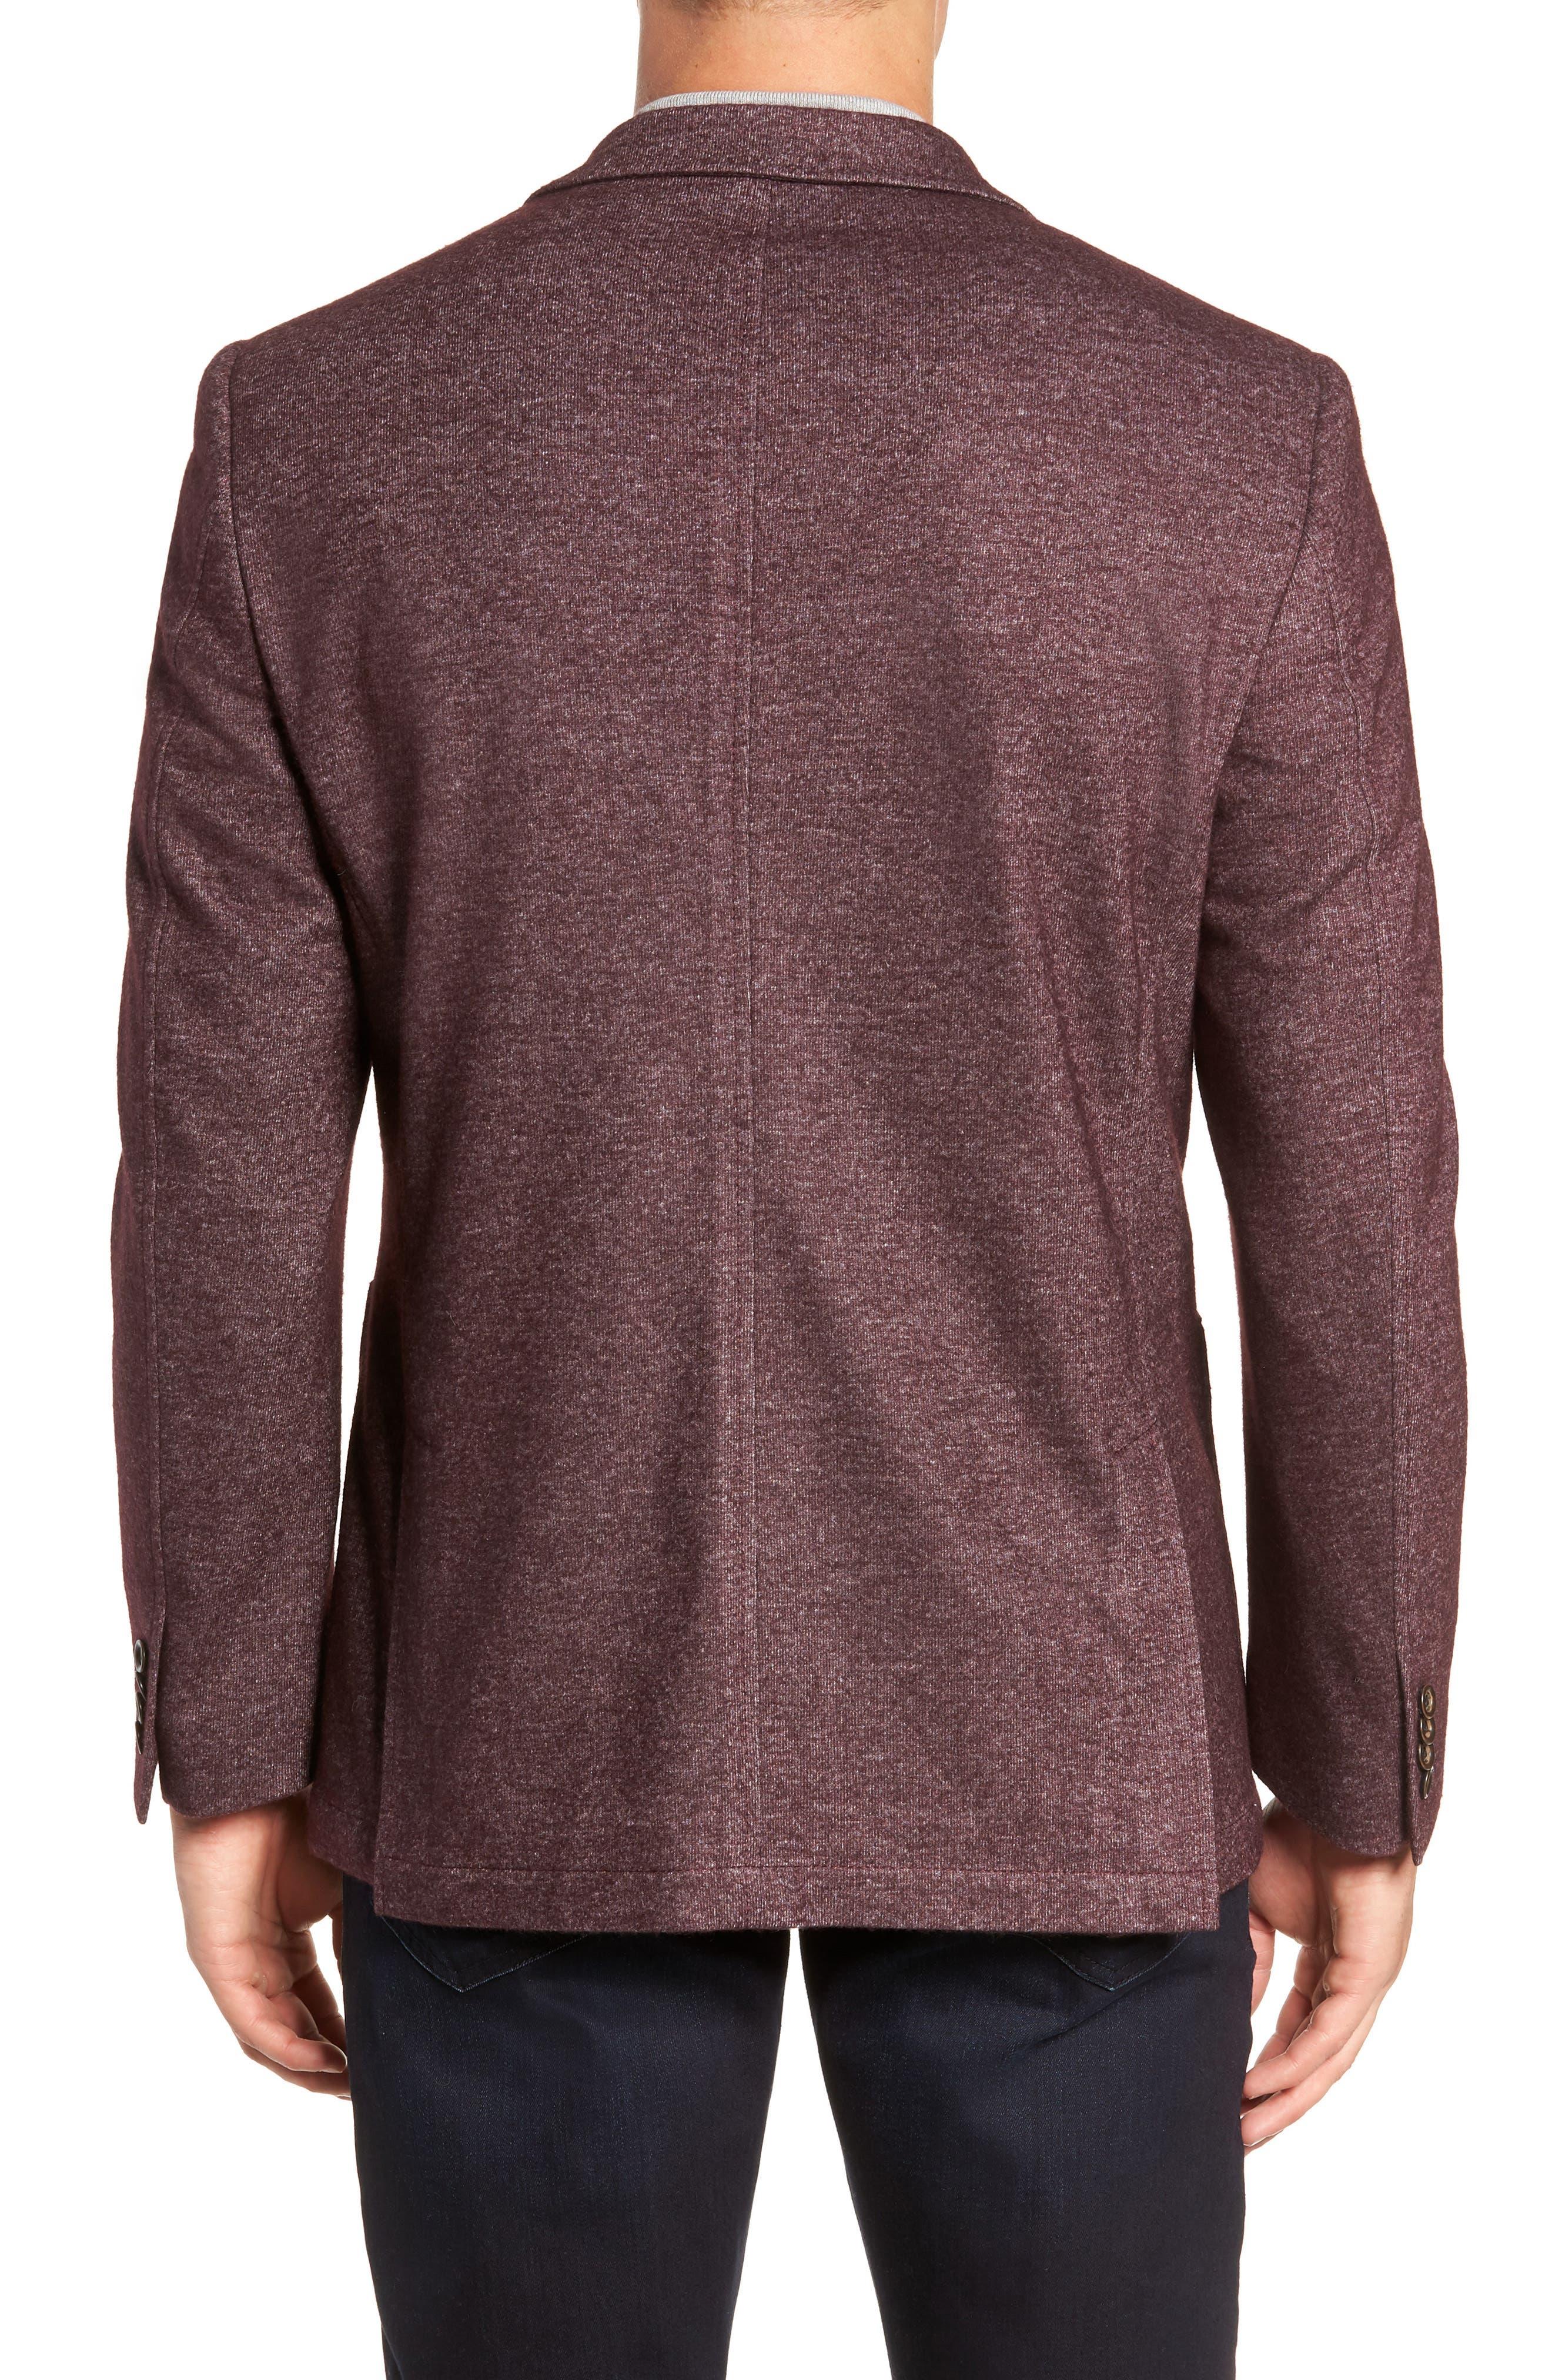 Regular Fit Knit Wool Blend Sport Coat,                             Alternate thumbnail 2, color,                             PORT